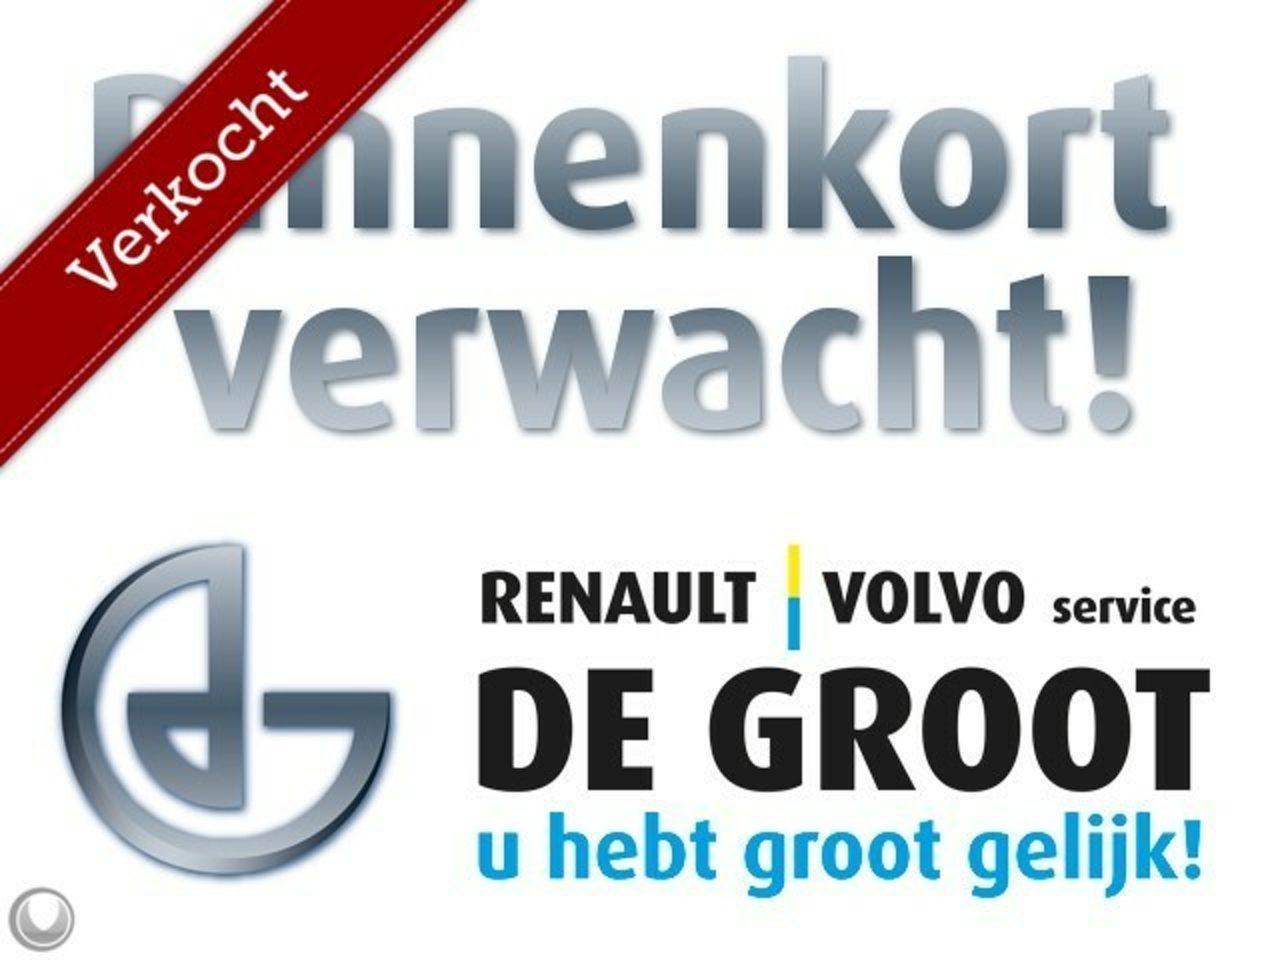 RenaultZoe - R90 Intens 41 kWh (ex Accu)